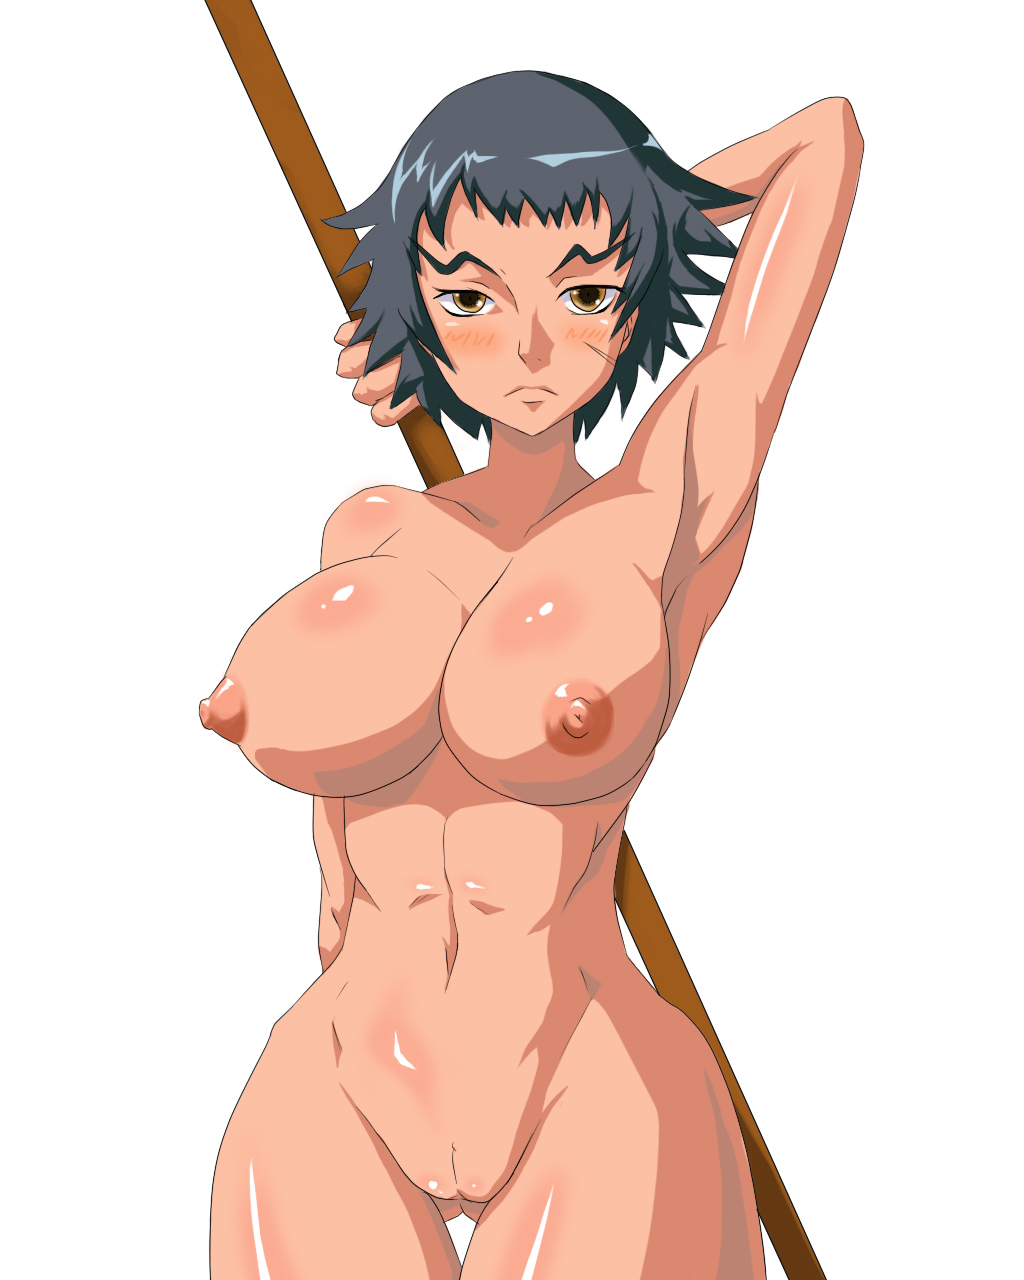 kenichi strongest history's hentai disciple Where is mishima persona 5